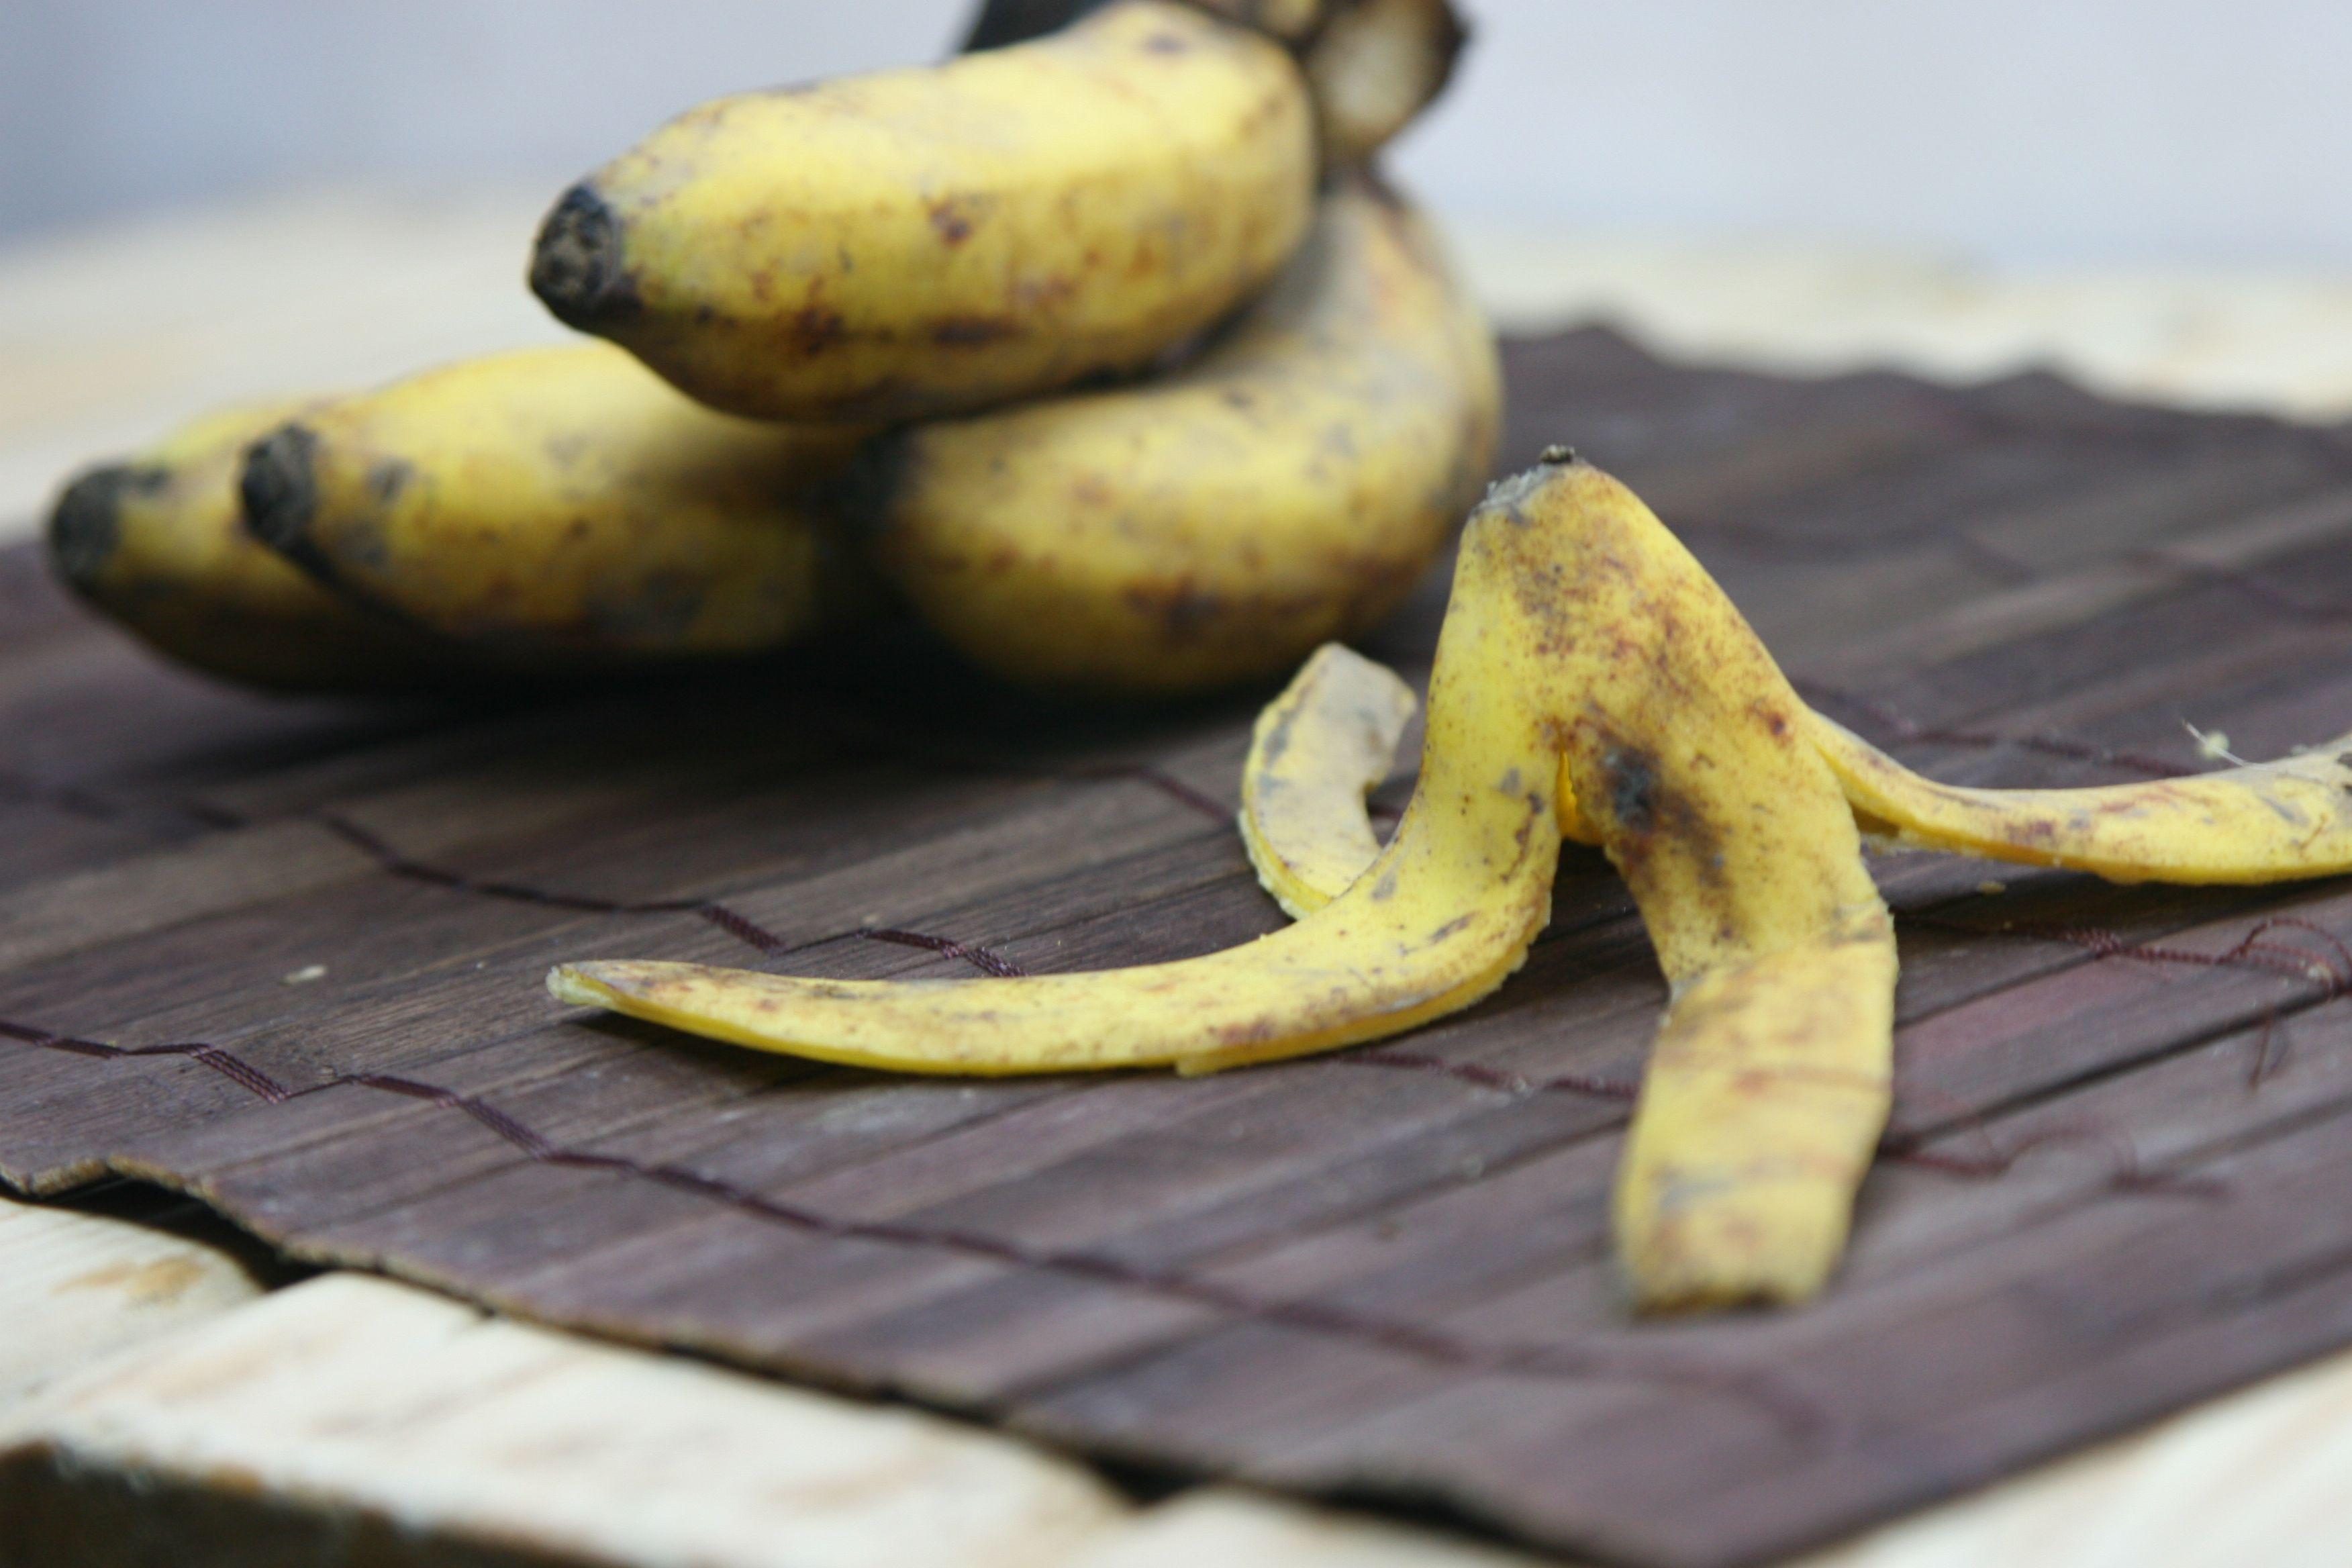 warts on hands banana peel)